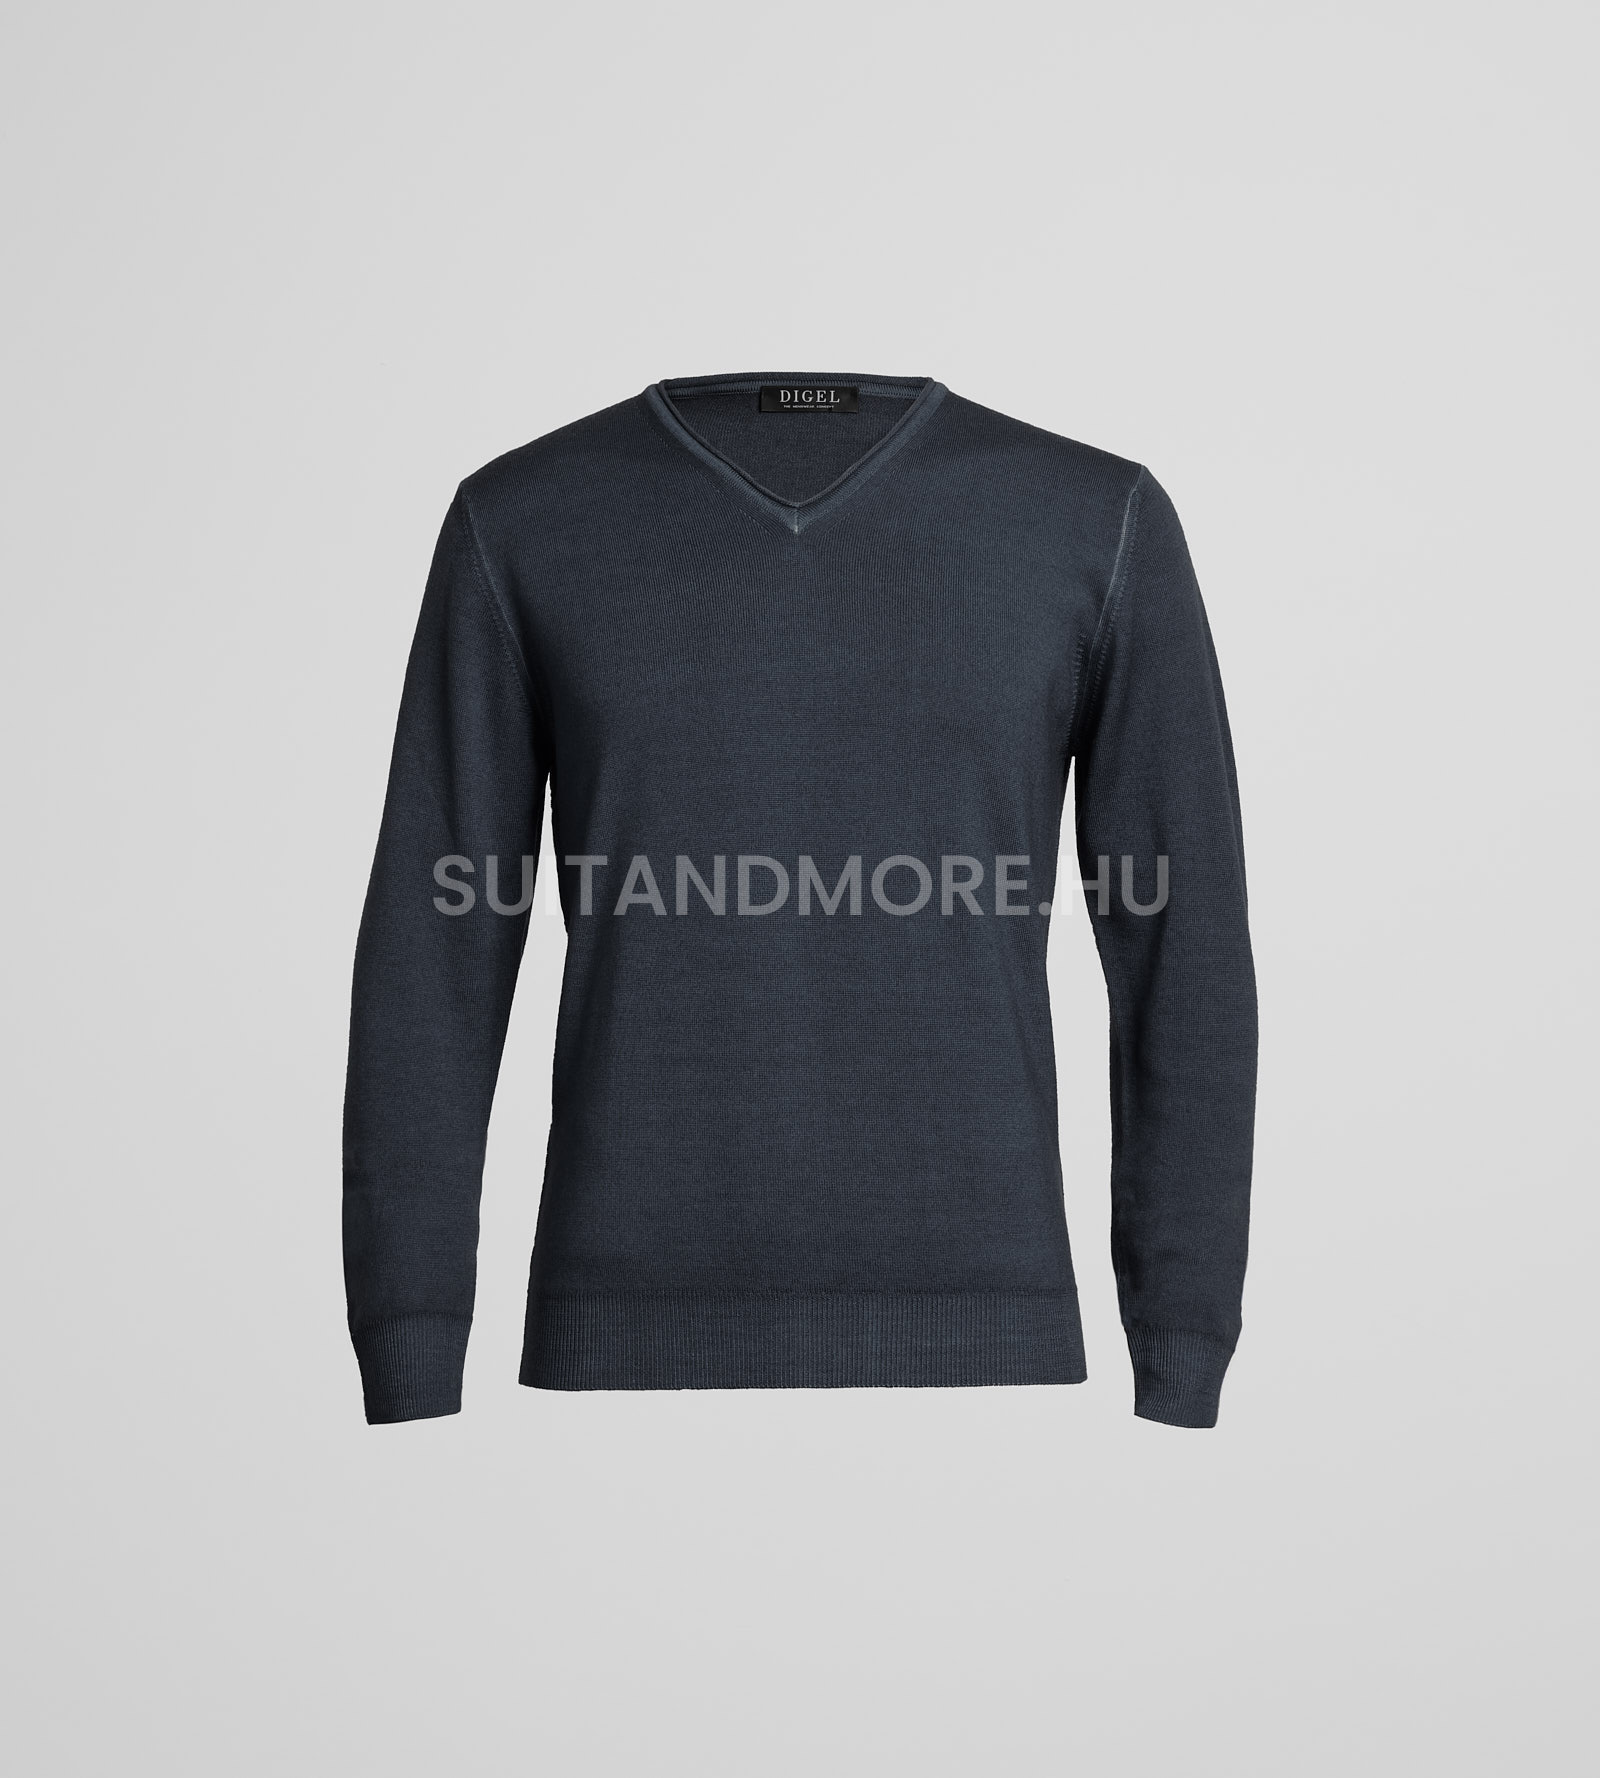 digel-sotetszurke-modern-fit-v-nyaku-gyapju-pulover-fabrizio1-1-1288001-40-01